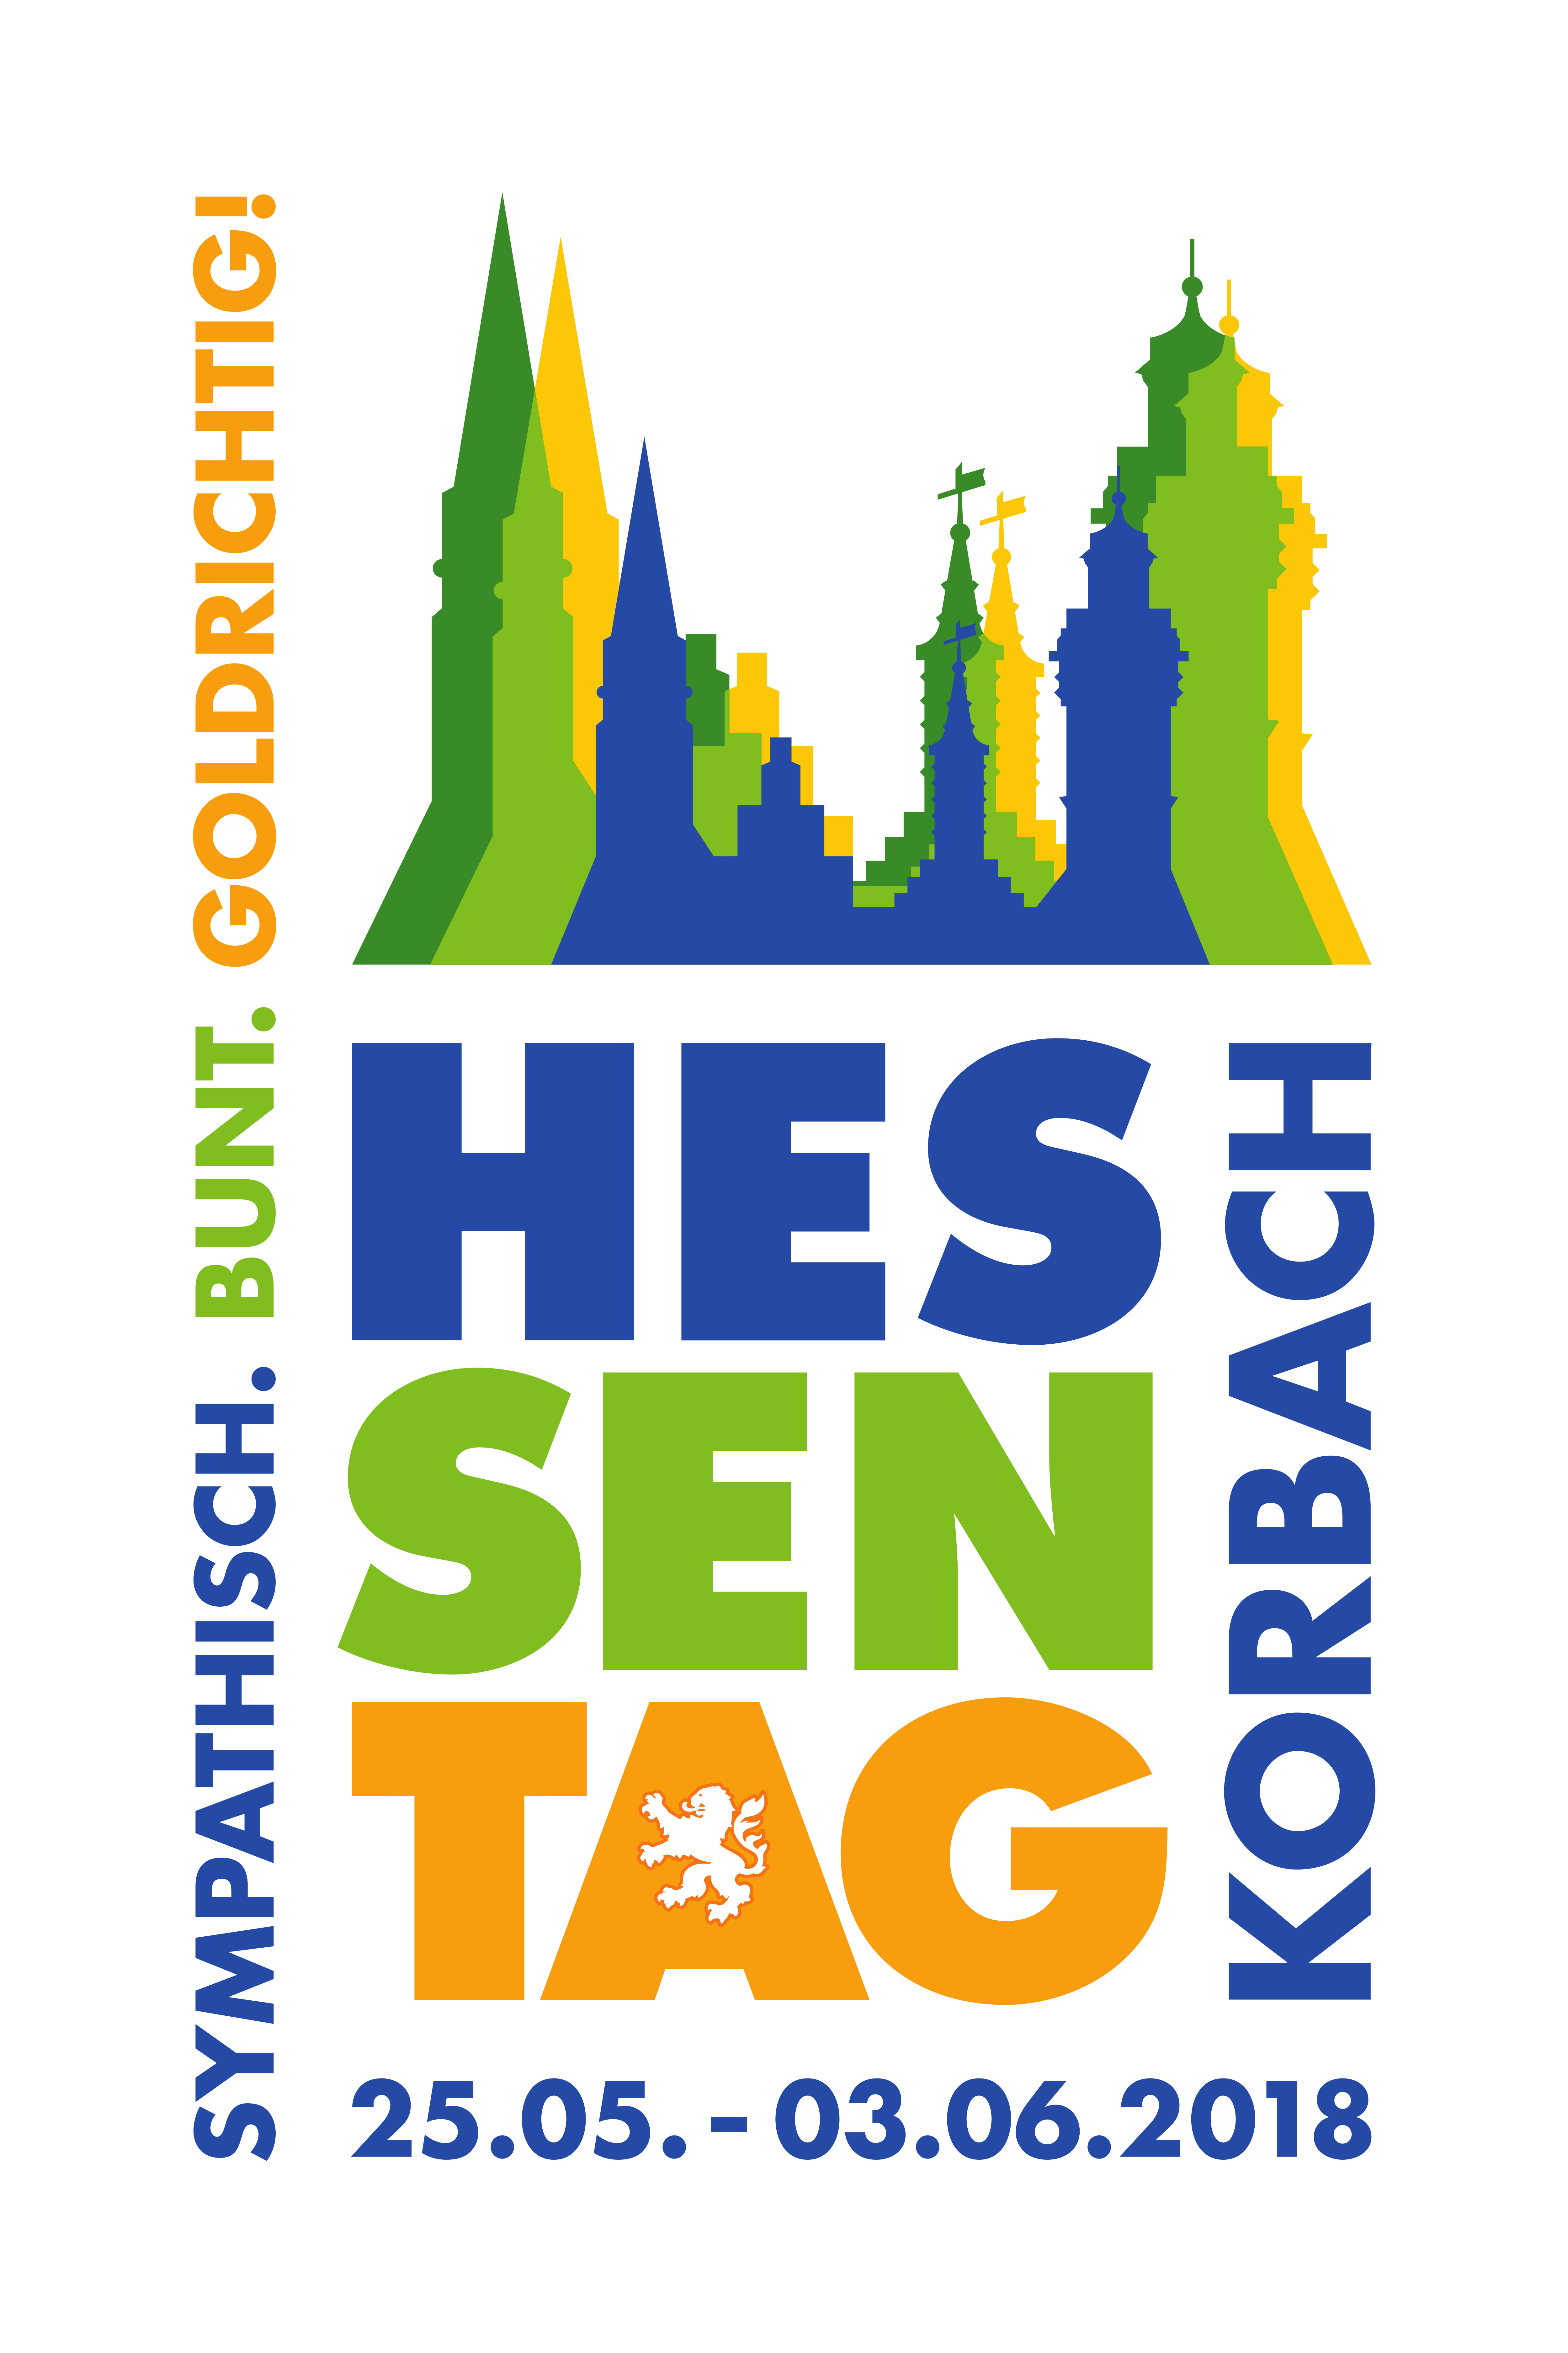 hessentag 2018 in korbach � oberhessenschau